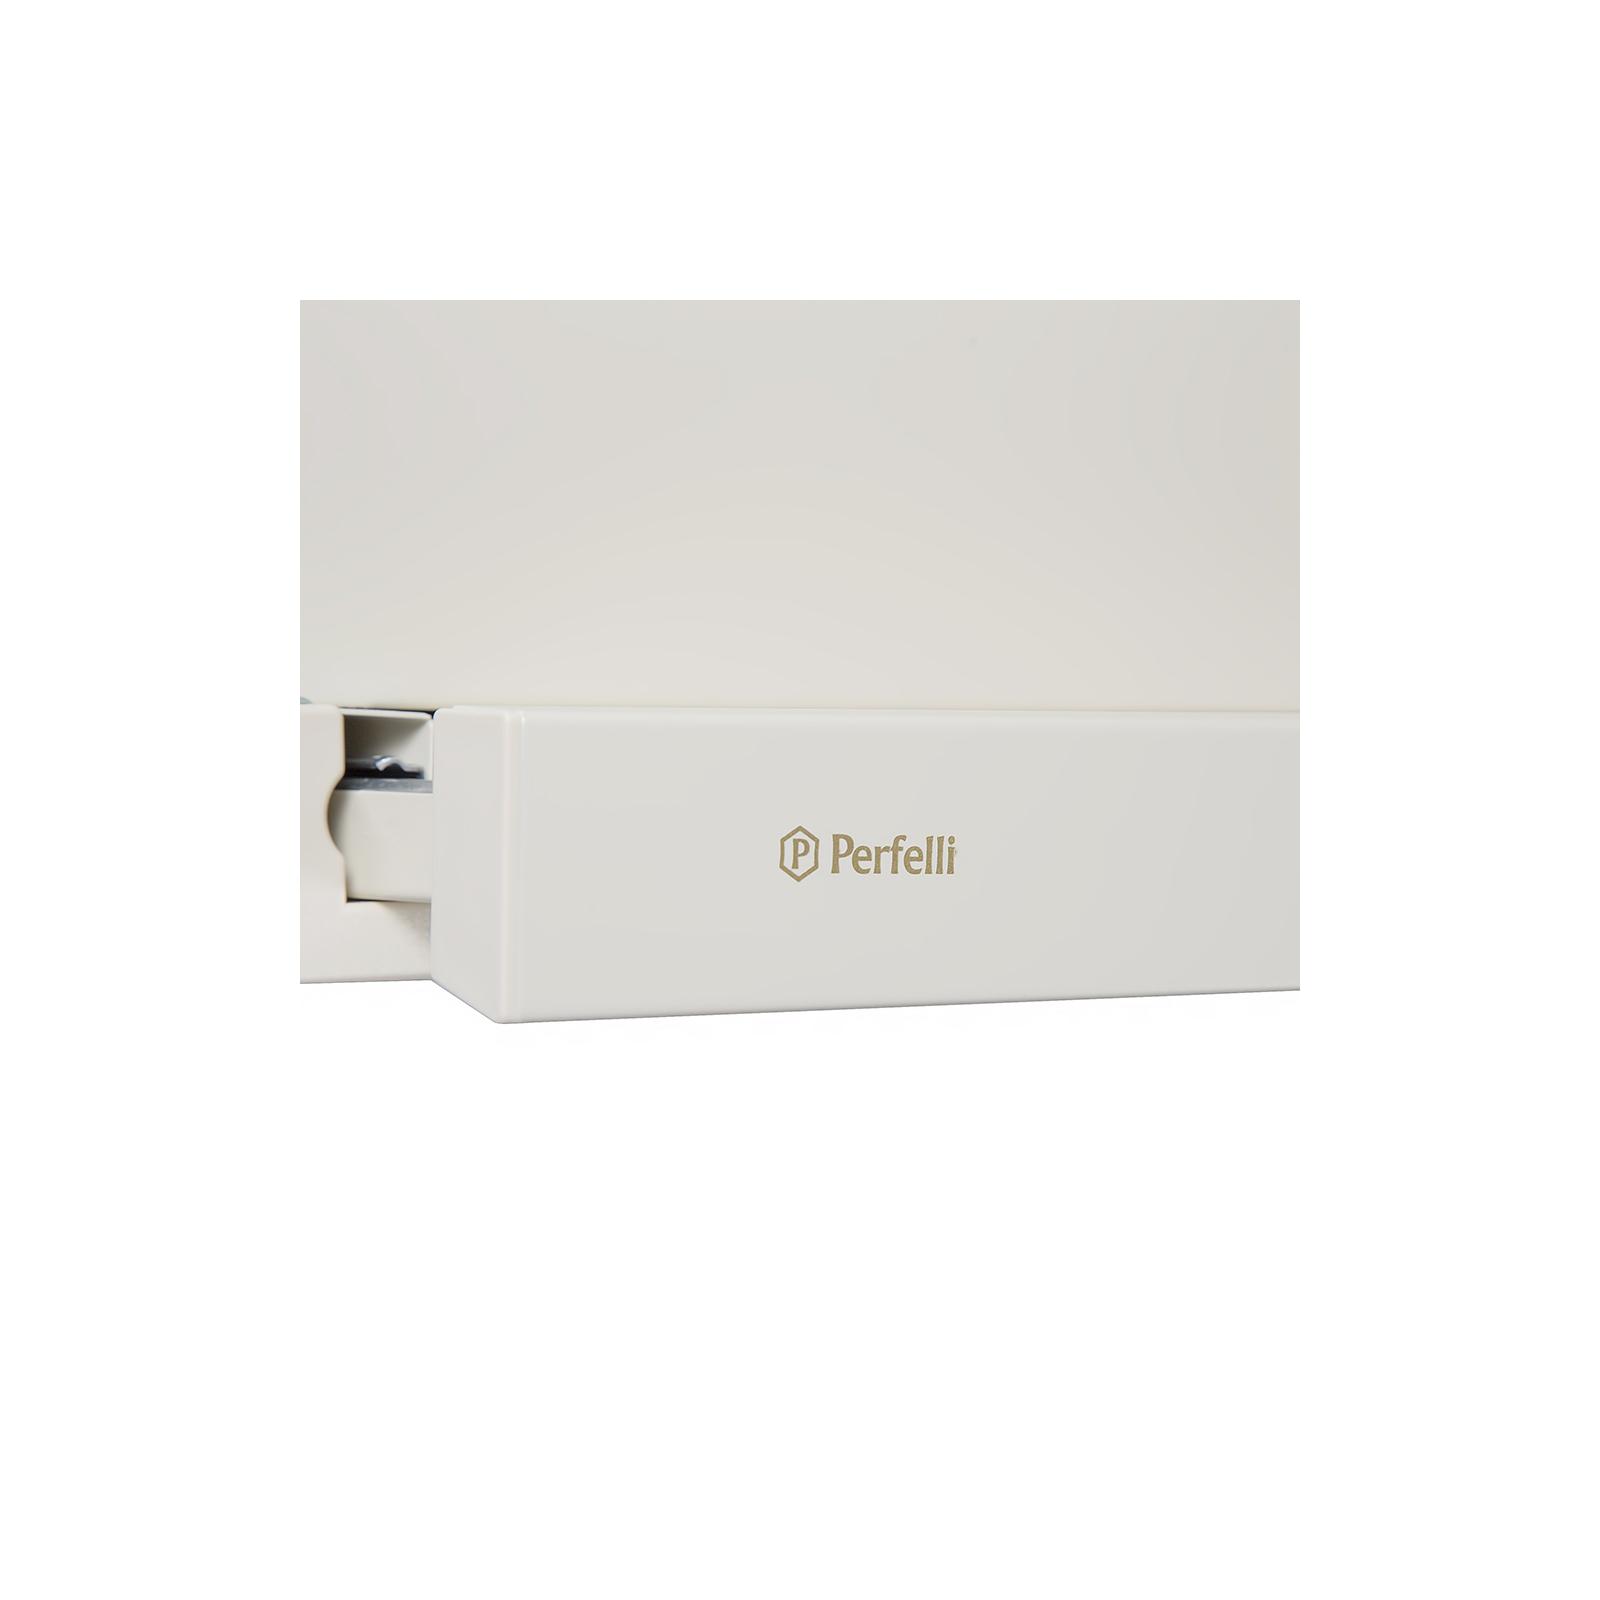 Вытяжка кухонная PERFELLI TL 5103 IV LED изображение 6